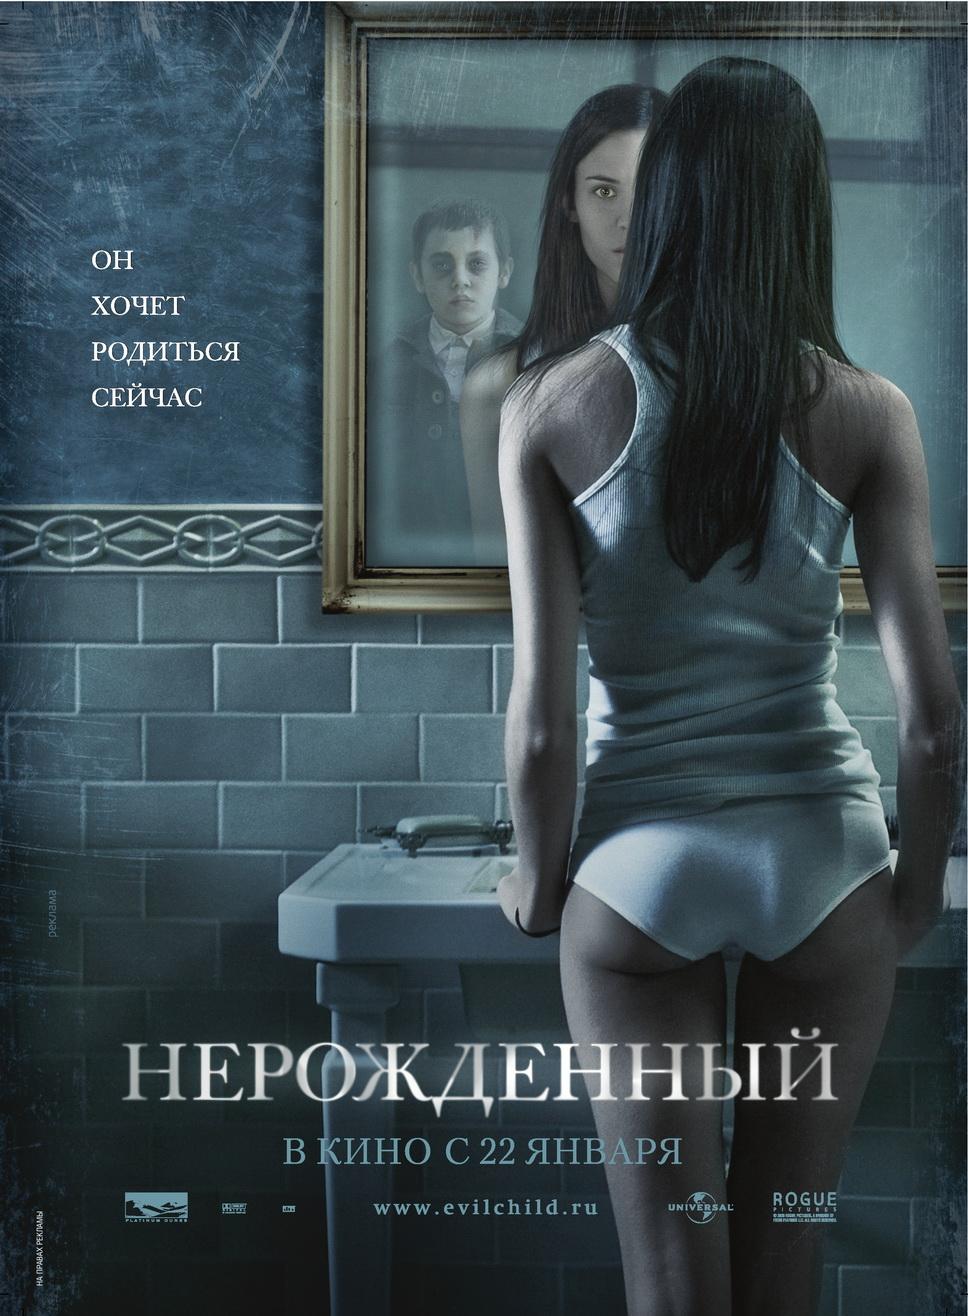 http://www.kinopoisk.ru/images/poster/883000.jpg